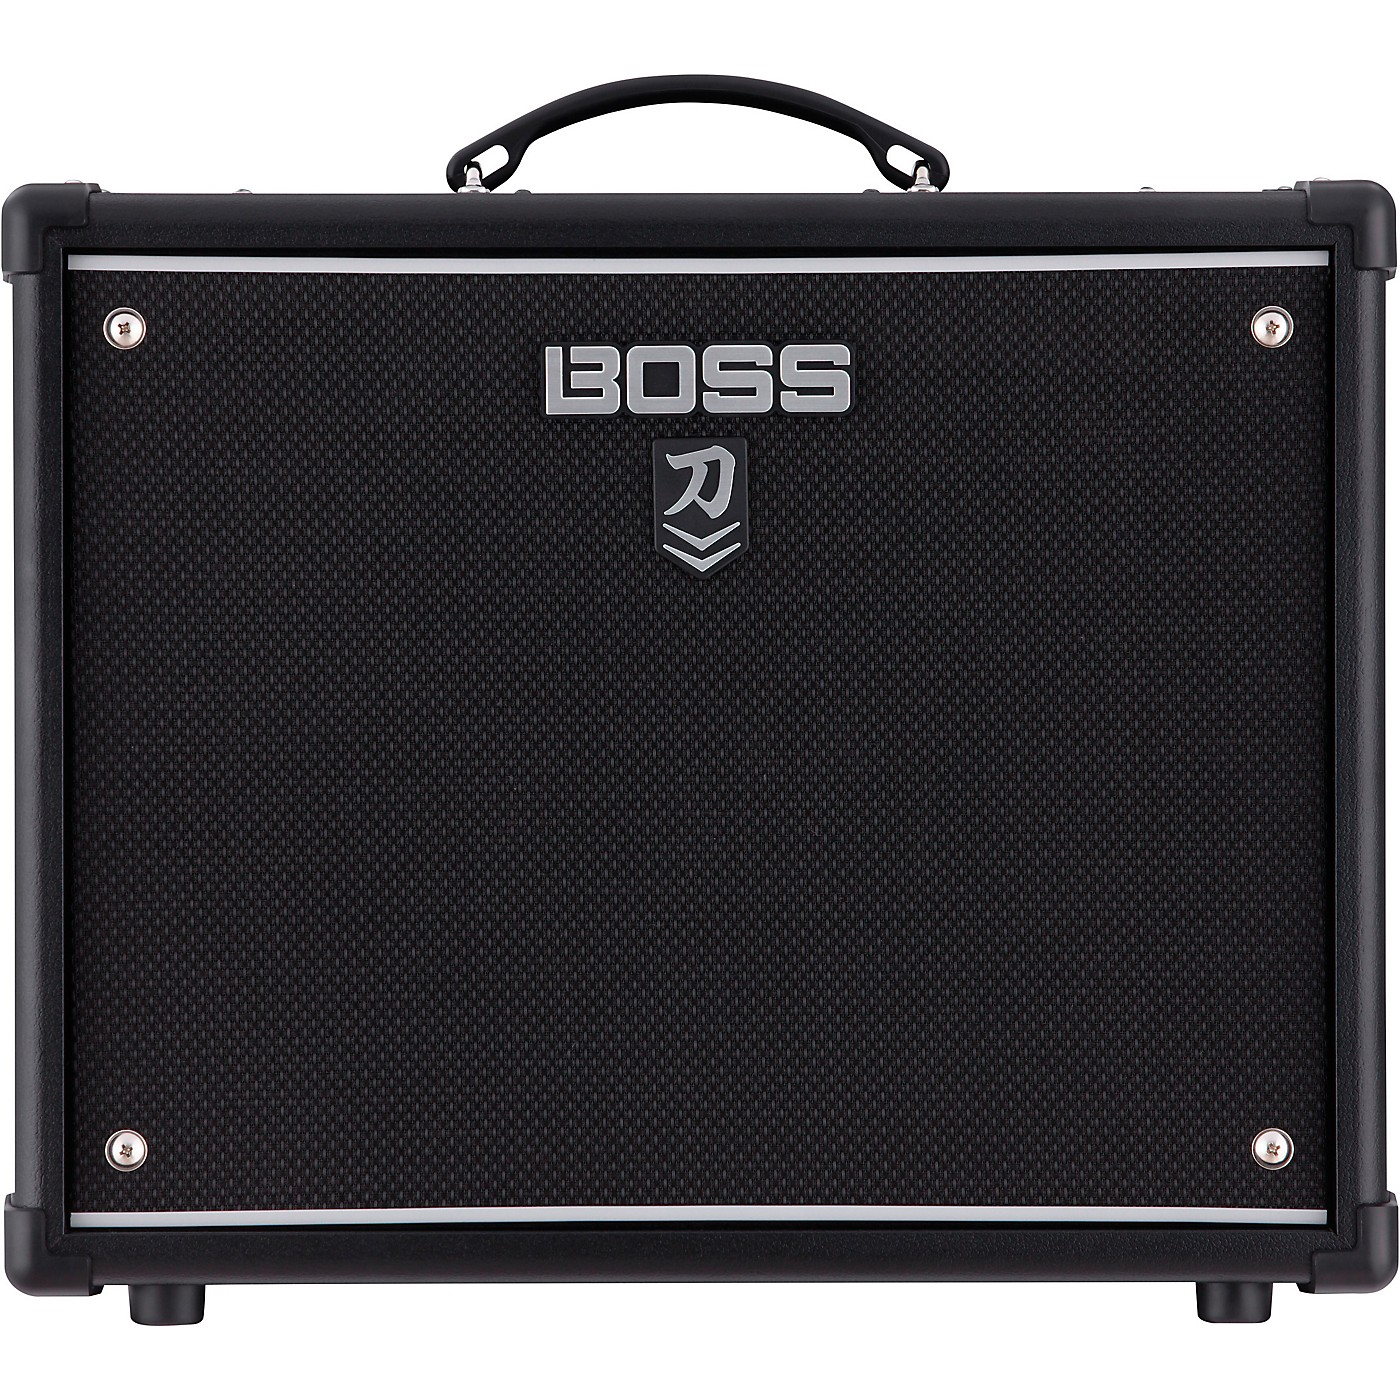 Boss Katana-50 MkII 50W 1x12 Guitar Combo Amplifier thumbnail